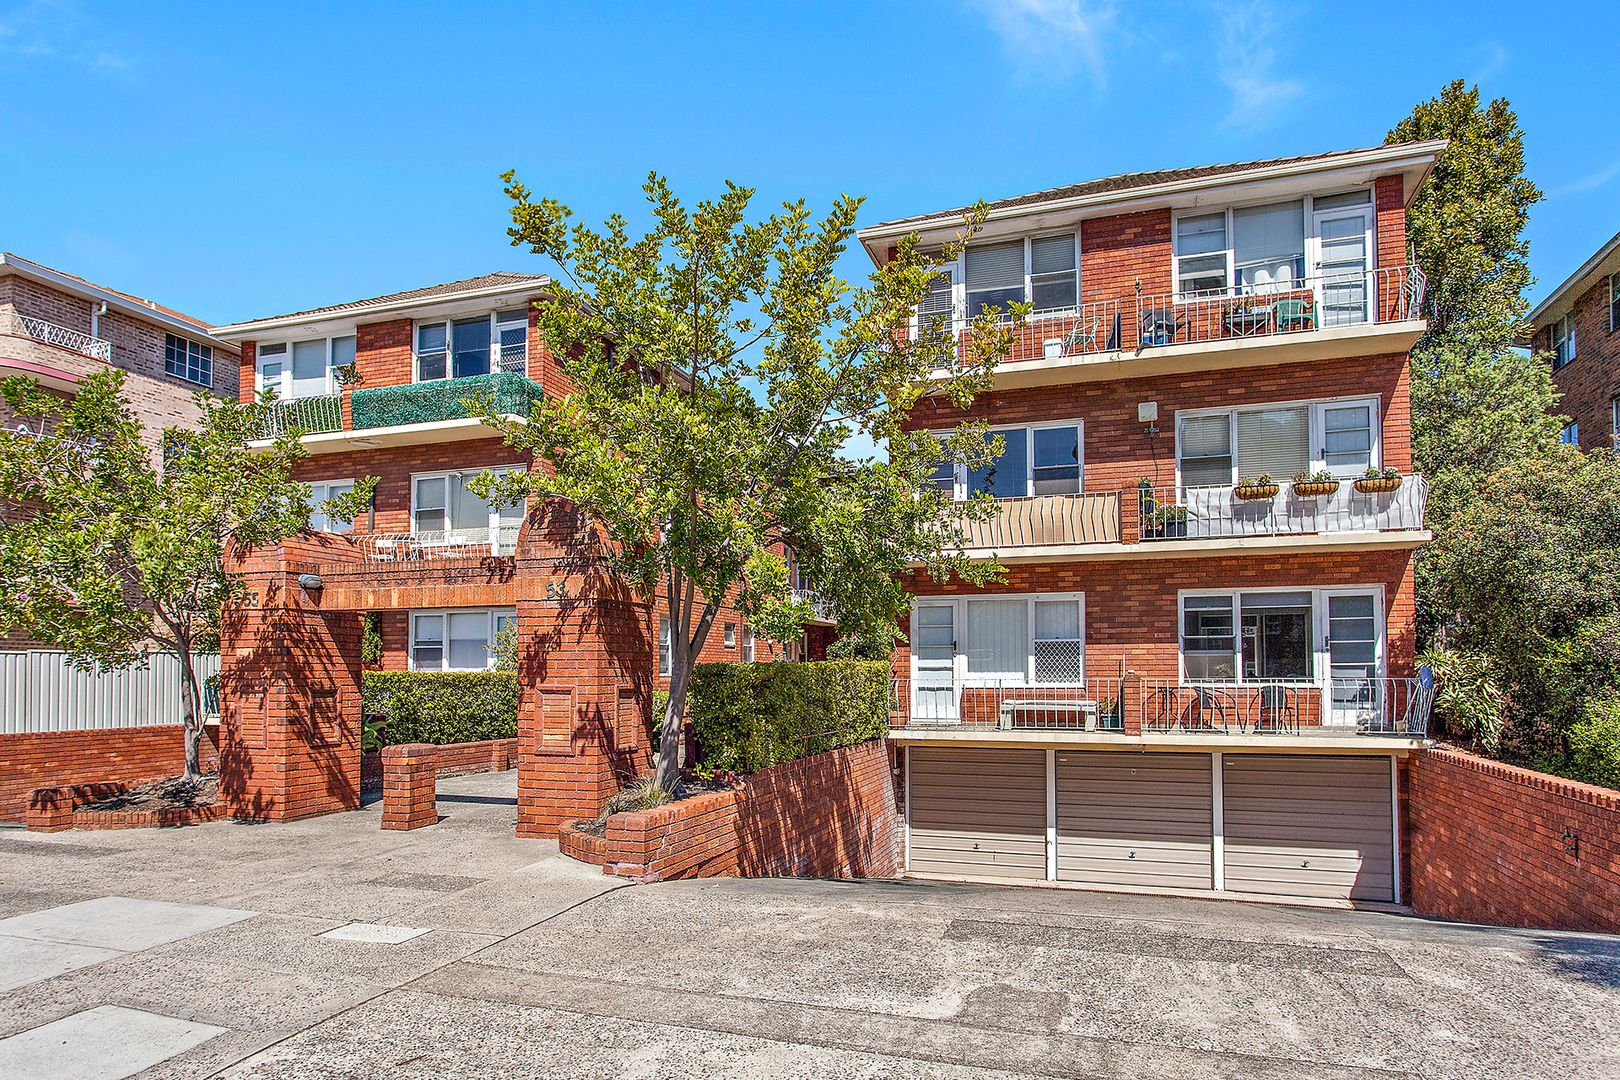 53-55 Banks Street, Monterey NSW 2217, Image 0